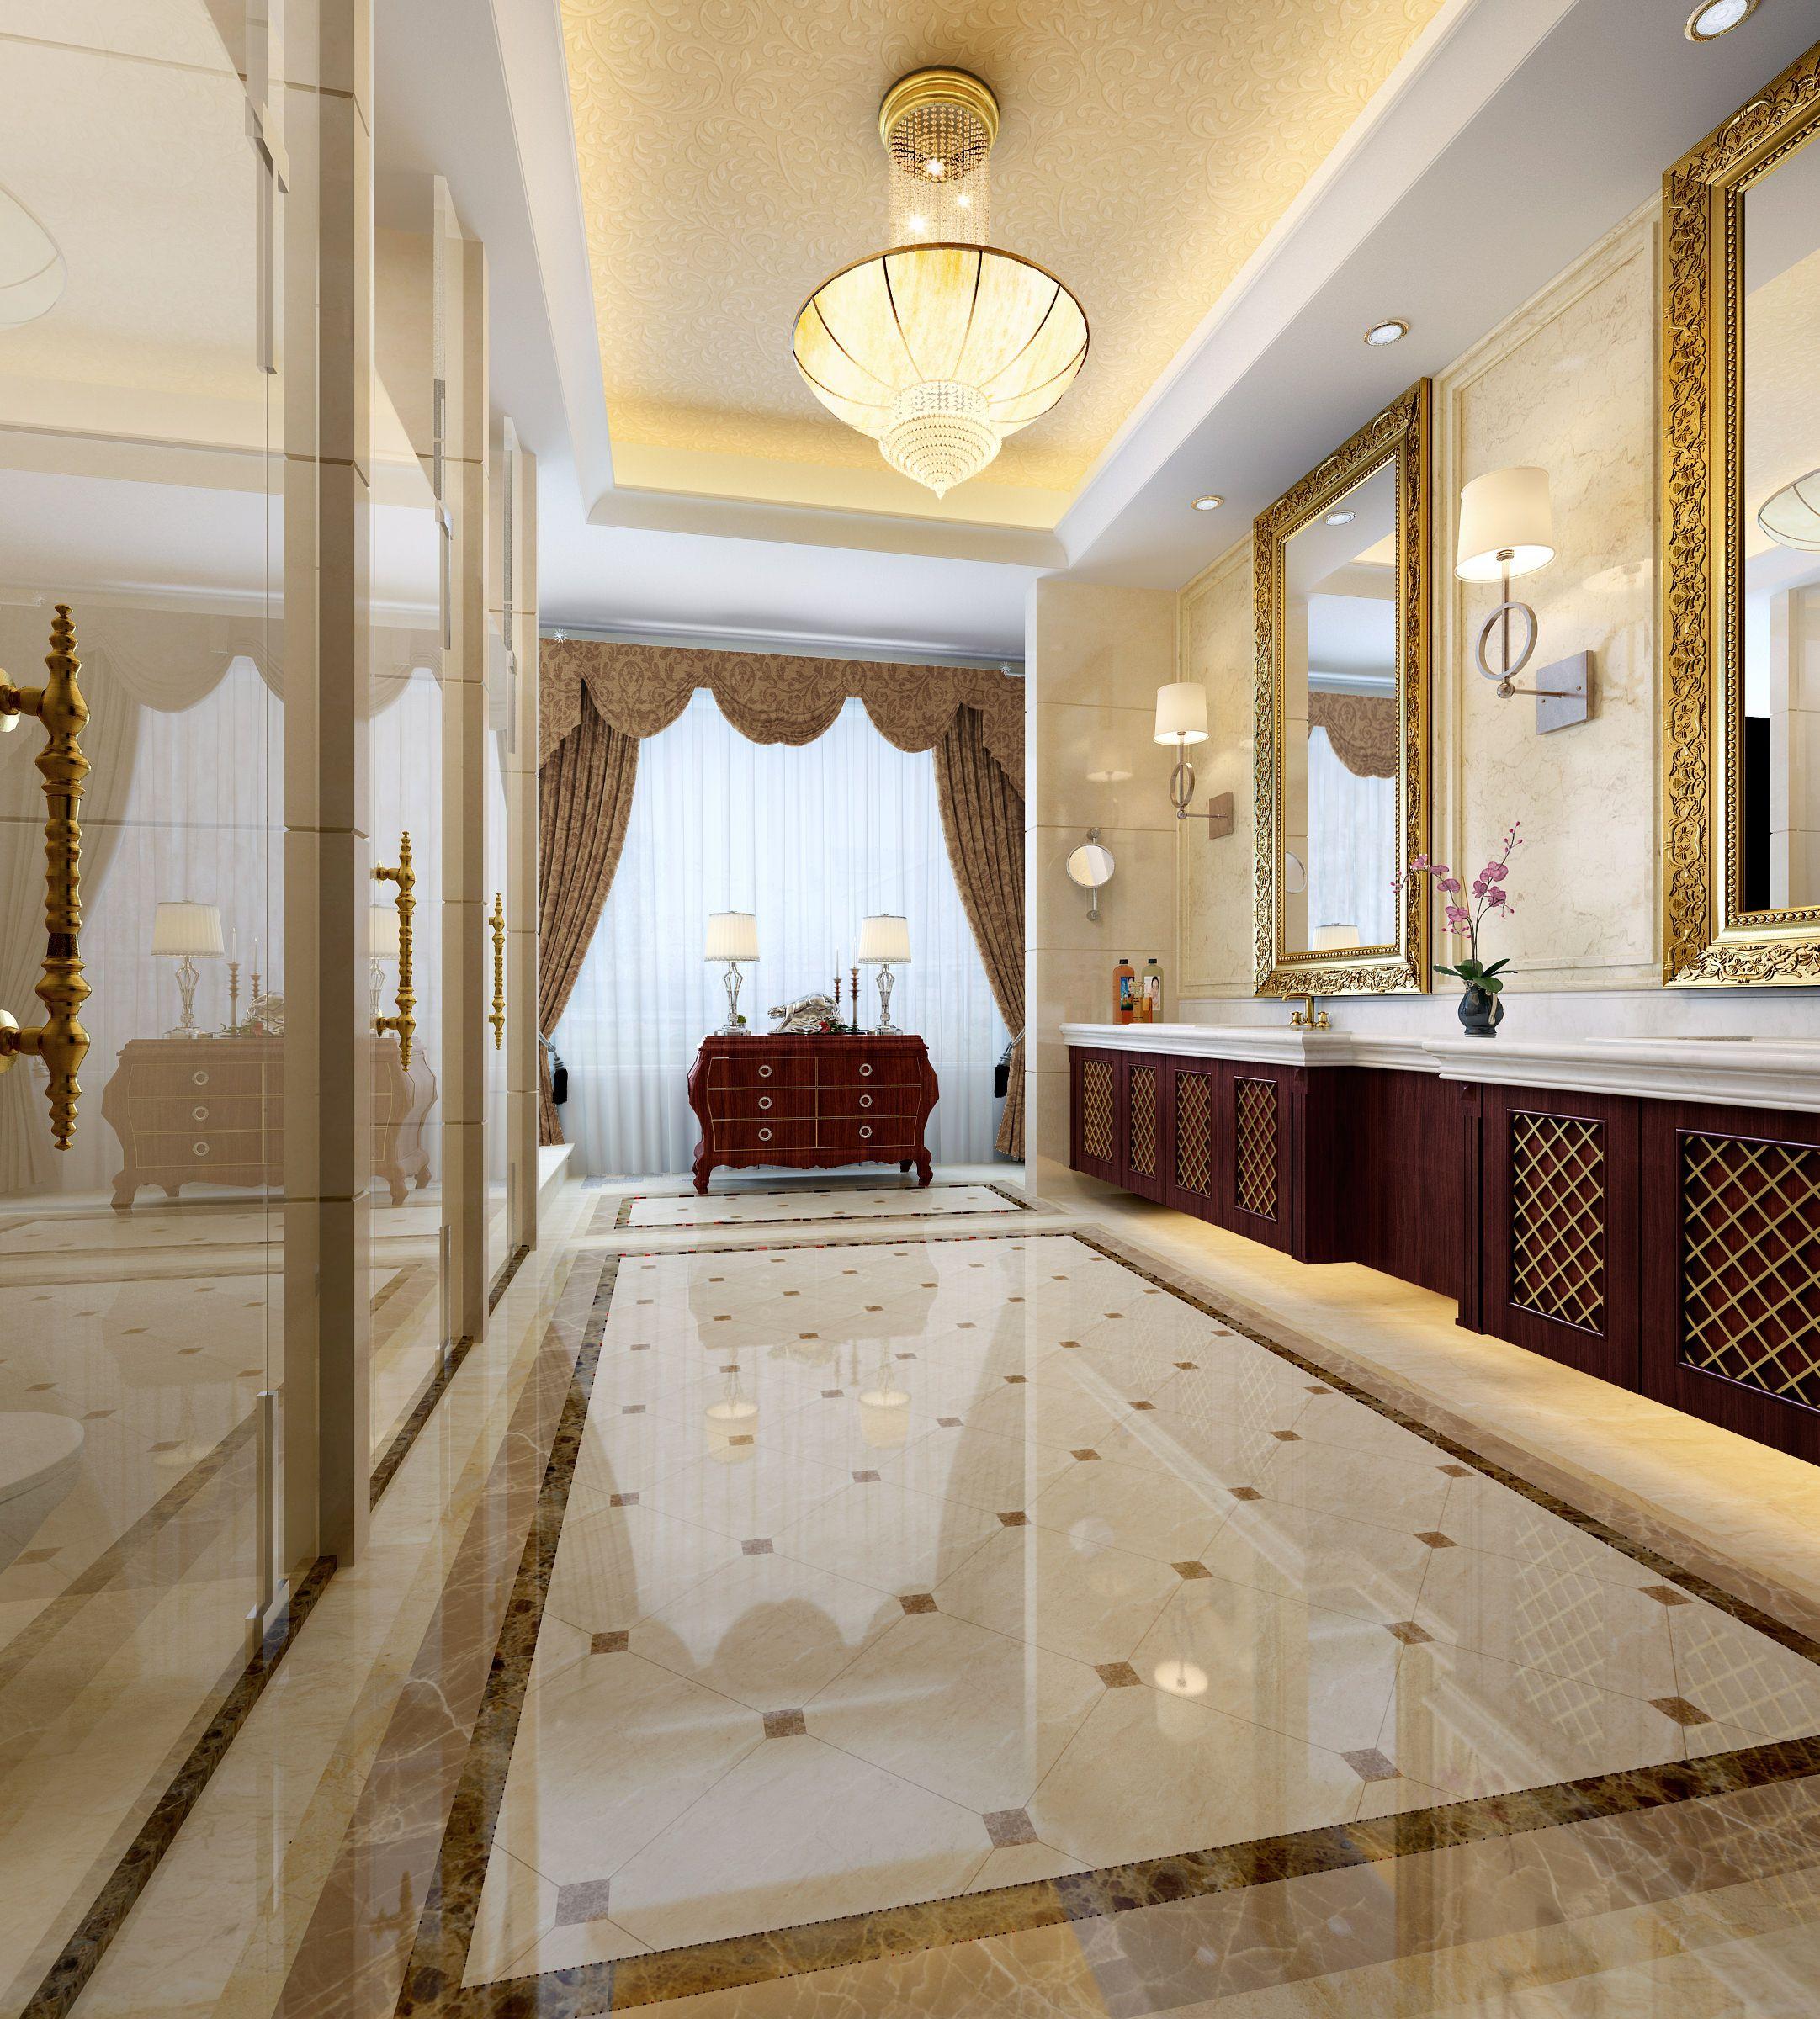 elegand and luxury bathroom 3d model max 1 | Bathroom ... on Bathroom Model Design  id=26285